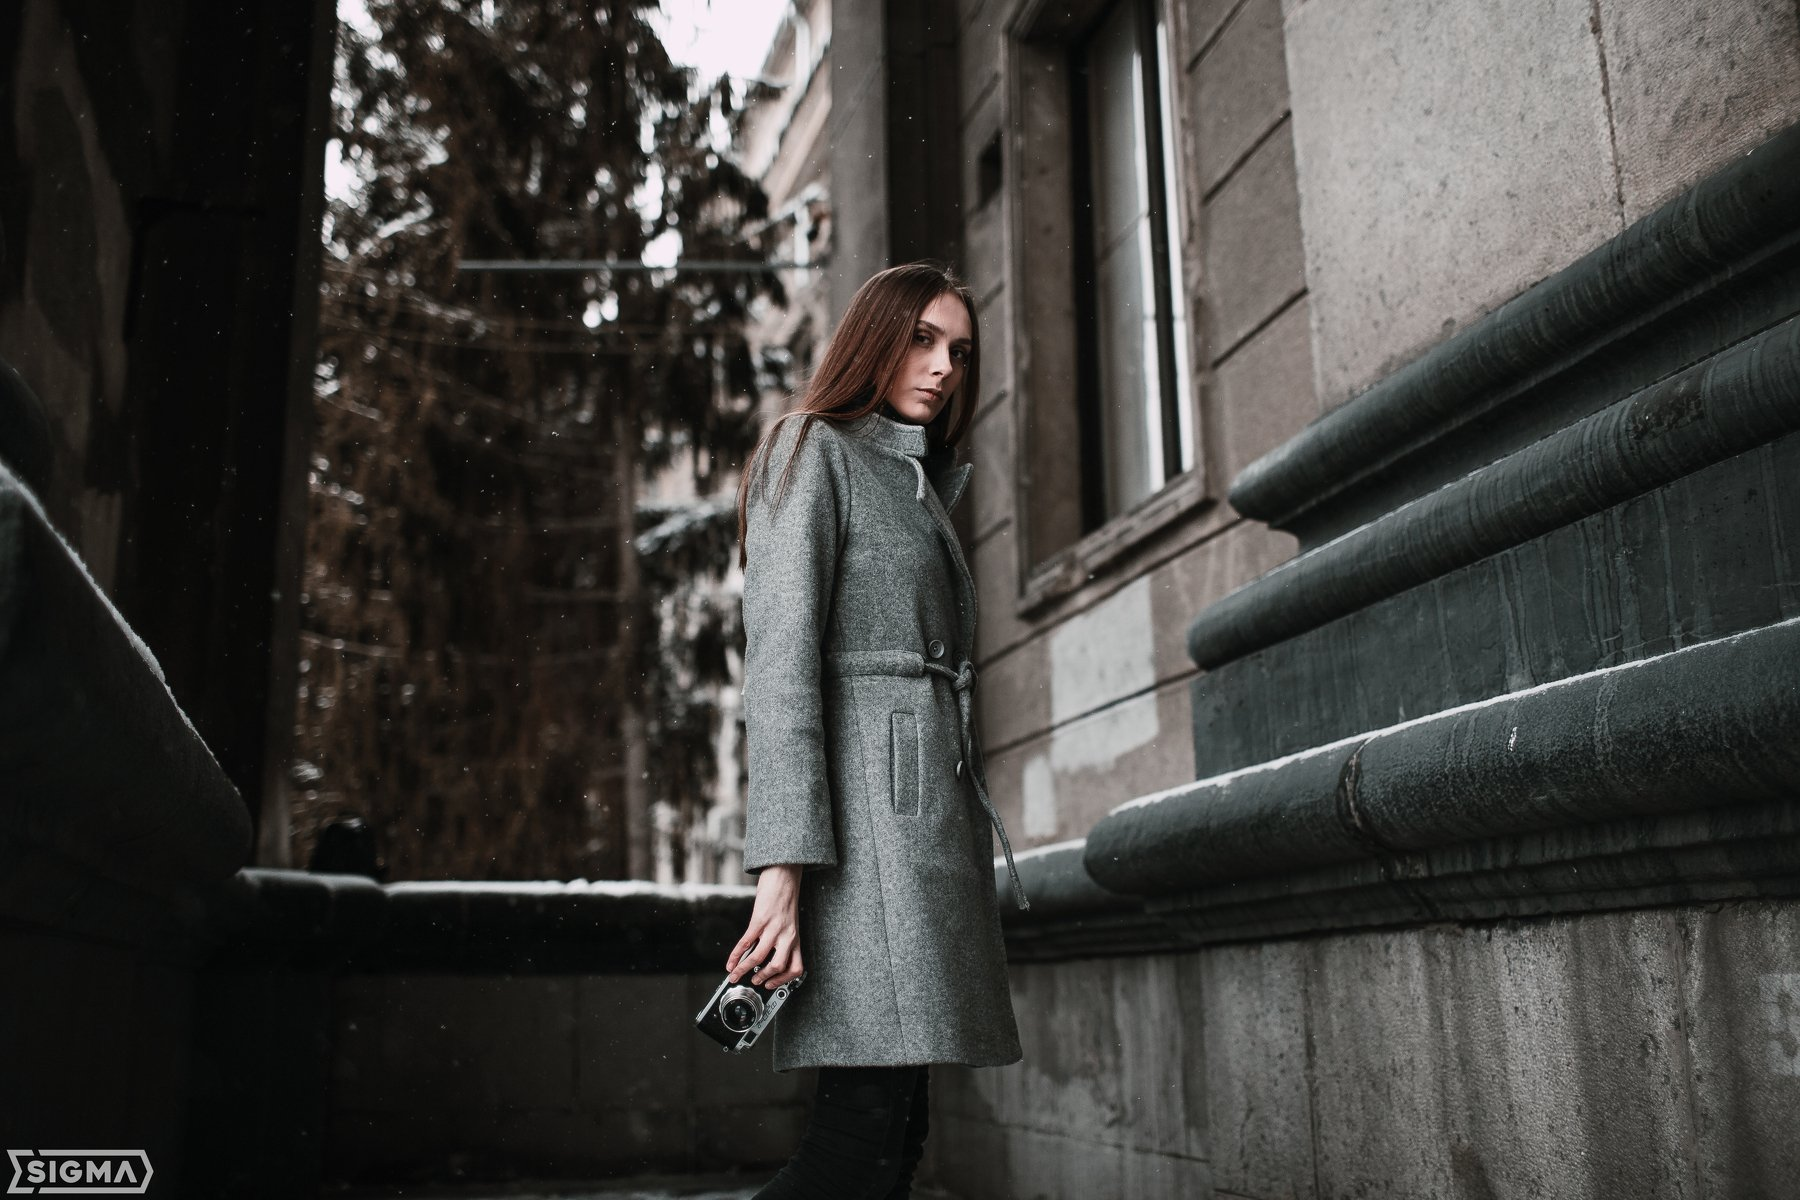 model, portrait, eyes, nice, soon, beautiful, cool, портет, арт, beauty, Kosolapov Artem